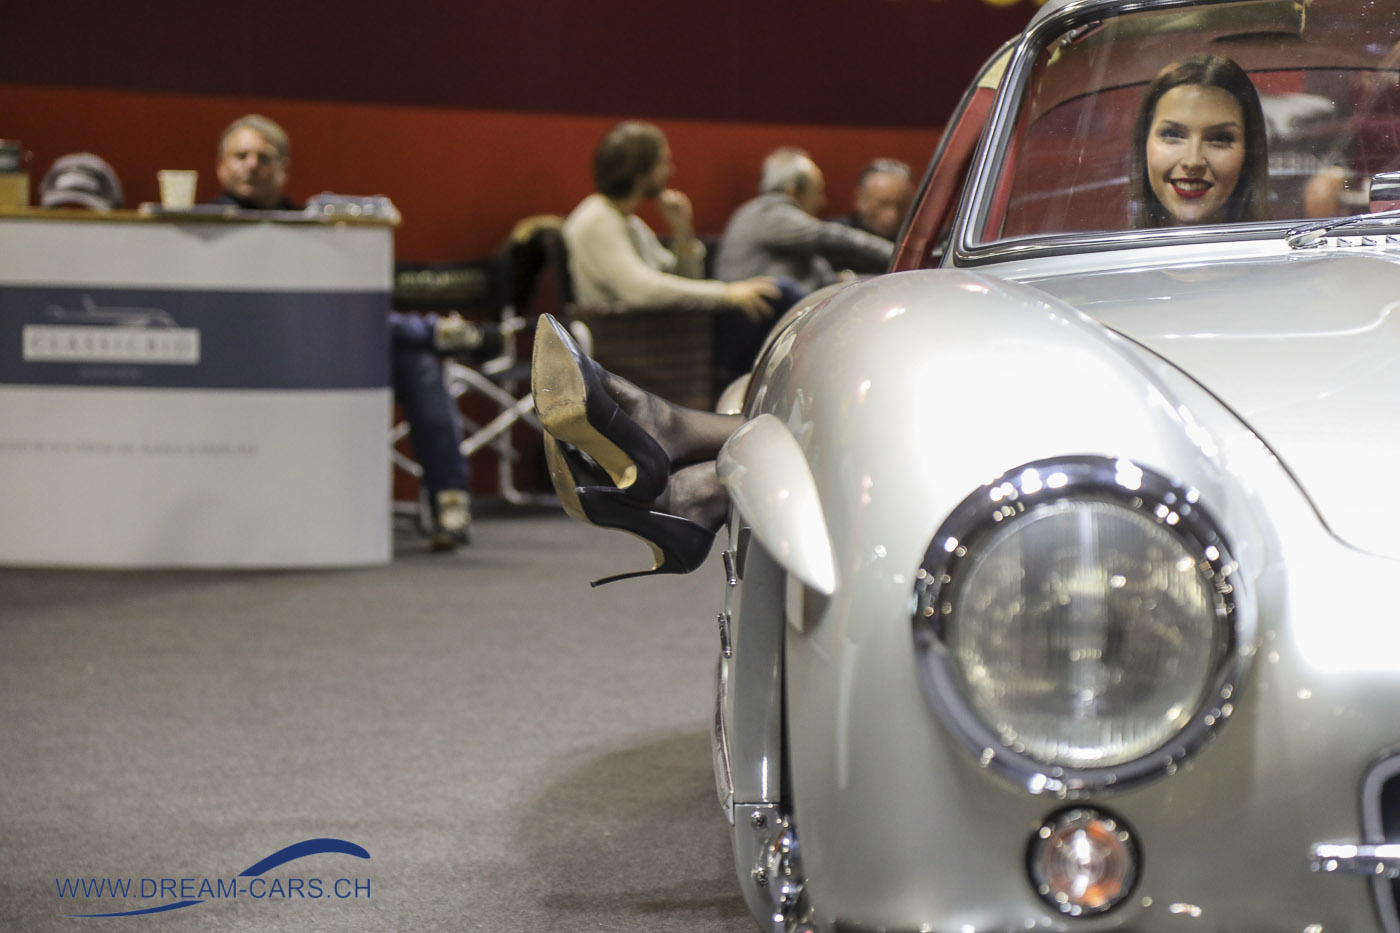 Milano AutoClassica, 23. - 25. November 2018. Ein Mercedes 300 SL am Stand der RETRO CLASSICS